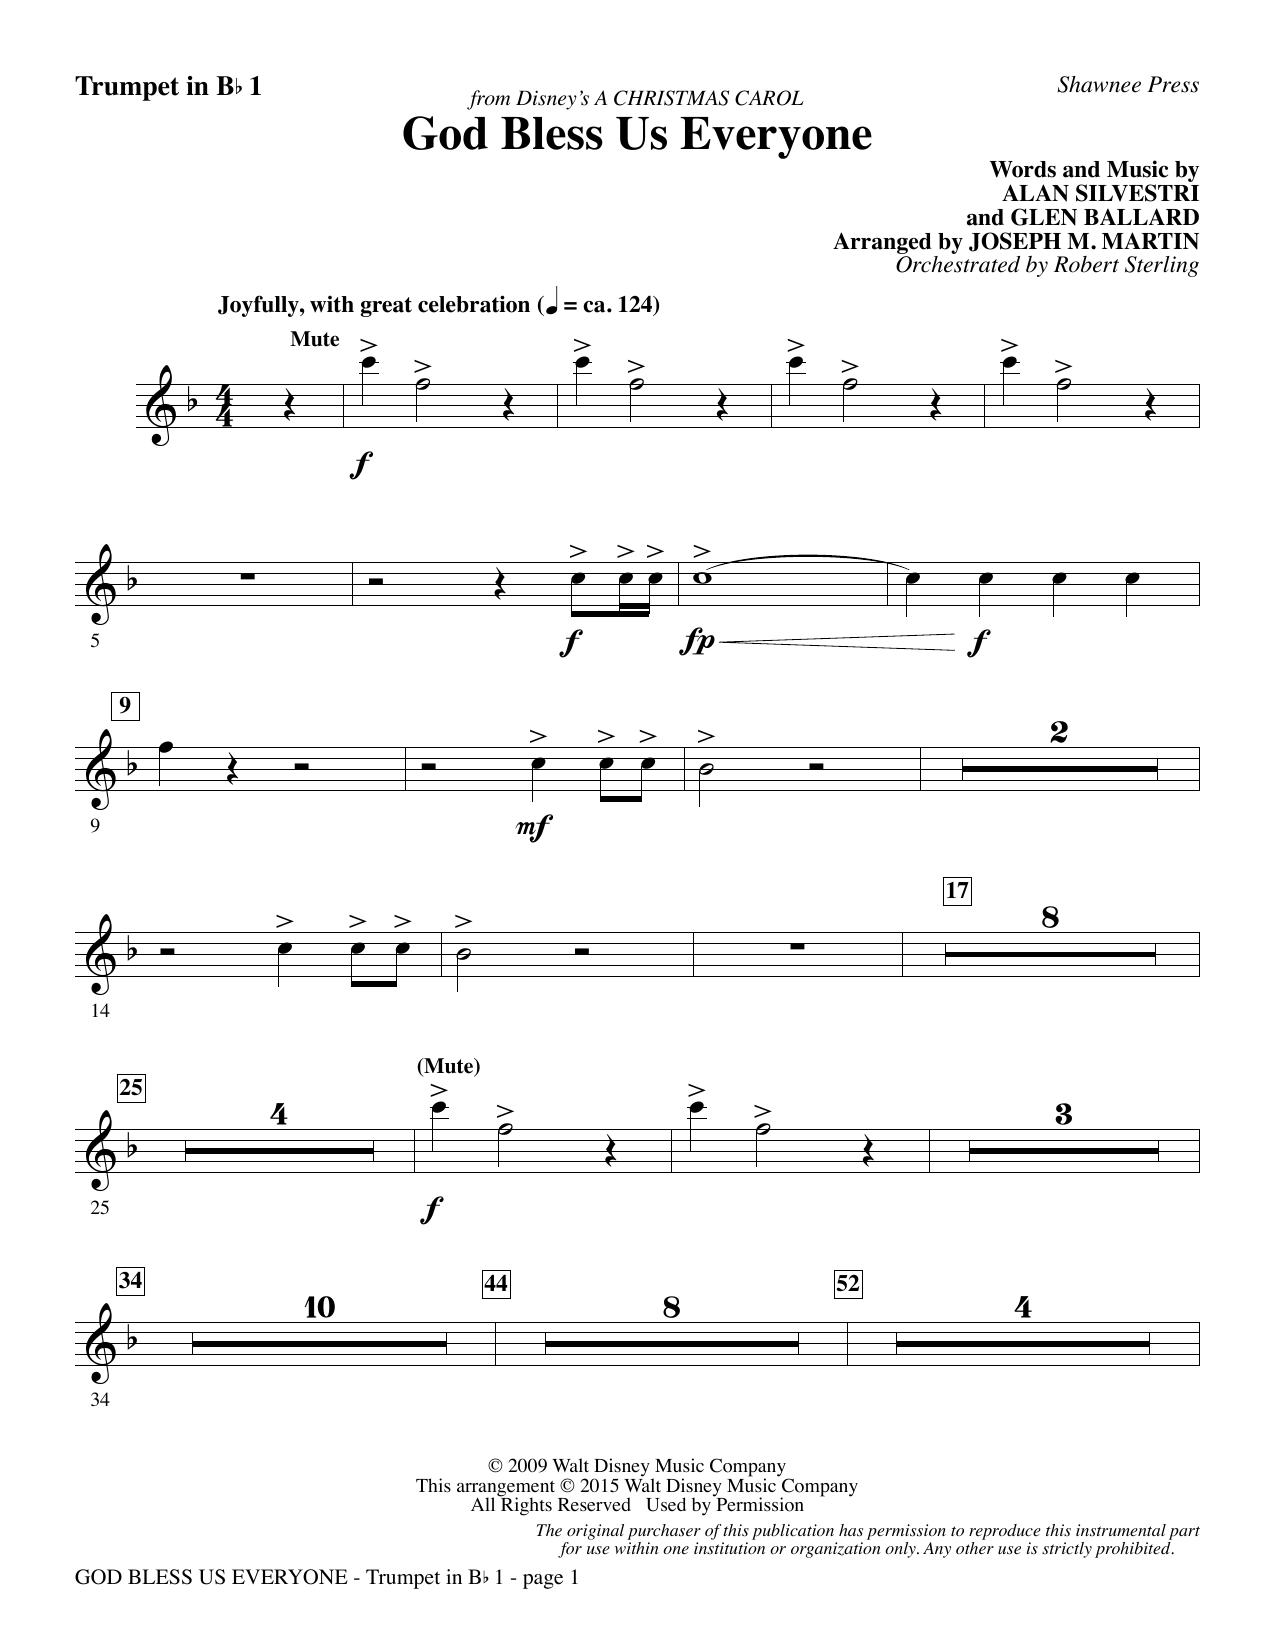 God Bless Us Everyone (from Disney's A Christmas Carol) - Bb Trumpet 1 sheet music